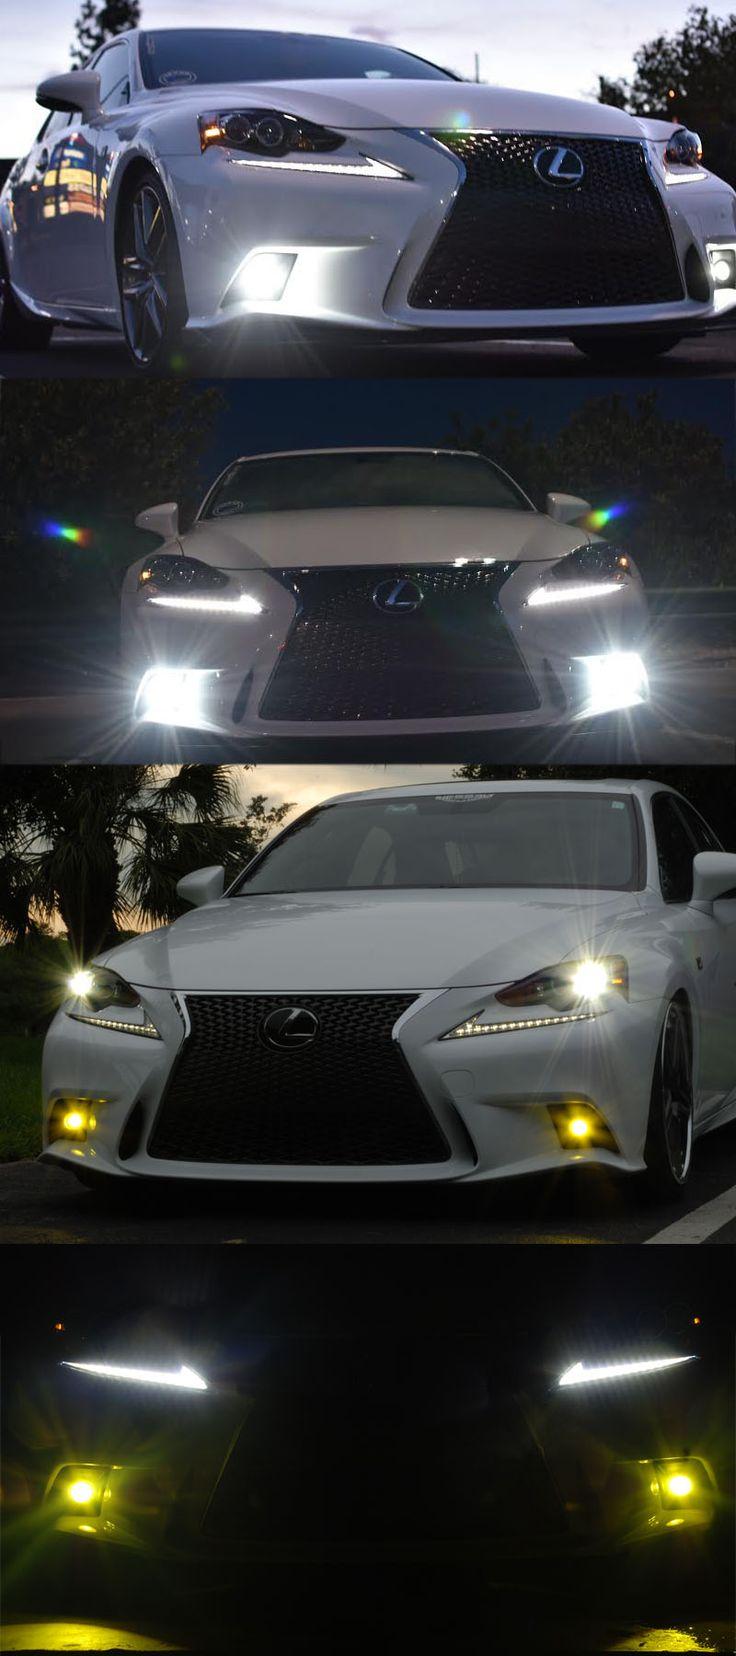 2014-up Lexus IS F-Sport LED fog lights www.newportlexus.com